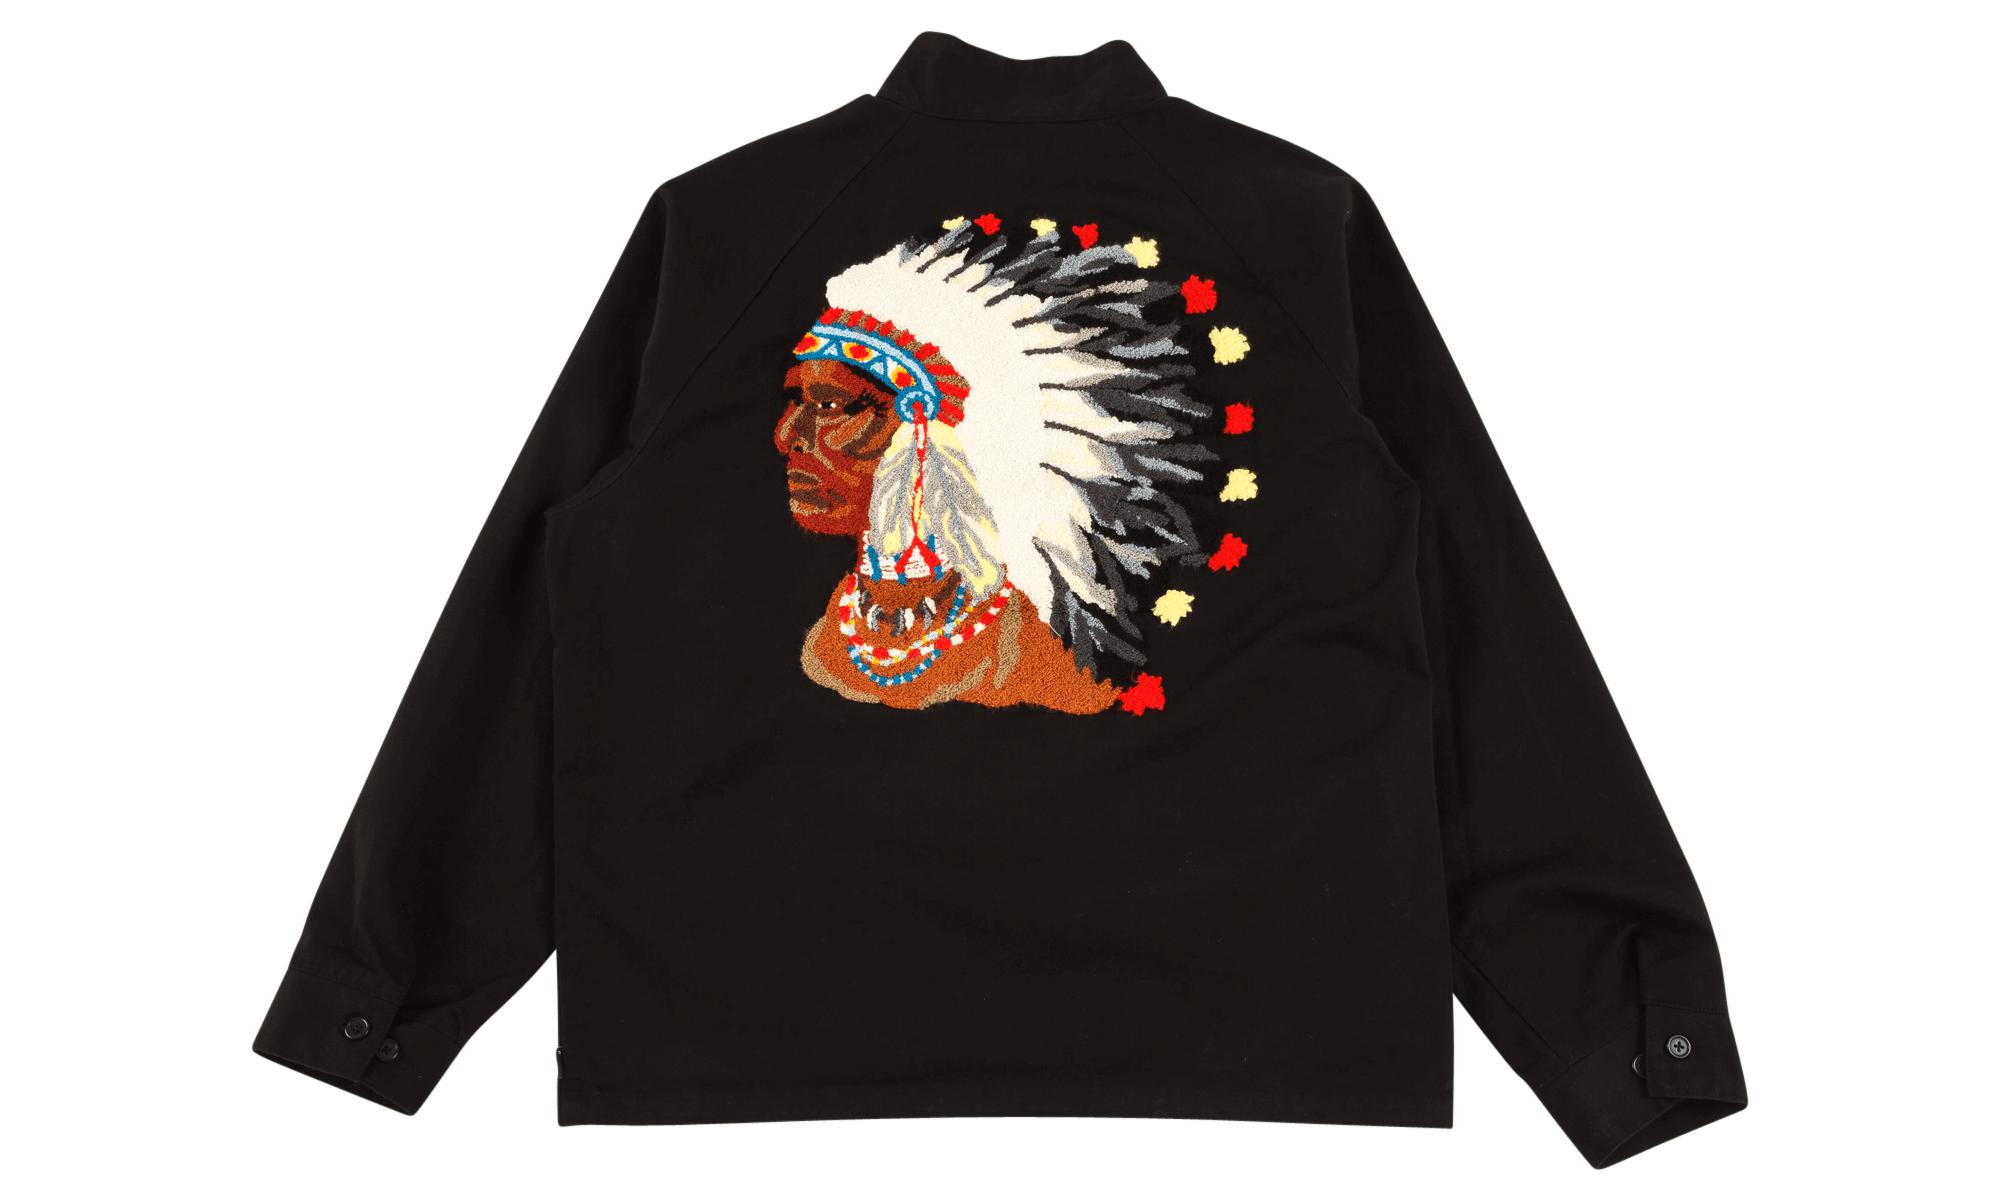 344eb51094790 Lyst - Supreme Chief Harrington Jacket in Black for Men - Save 10%